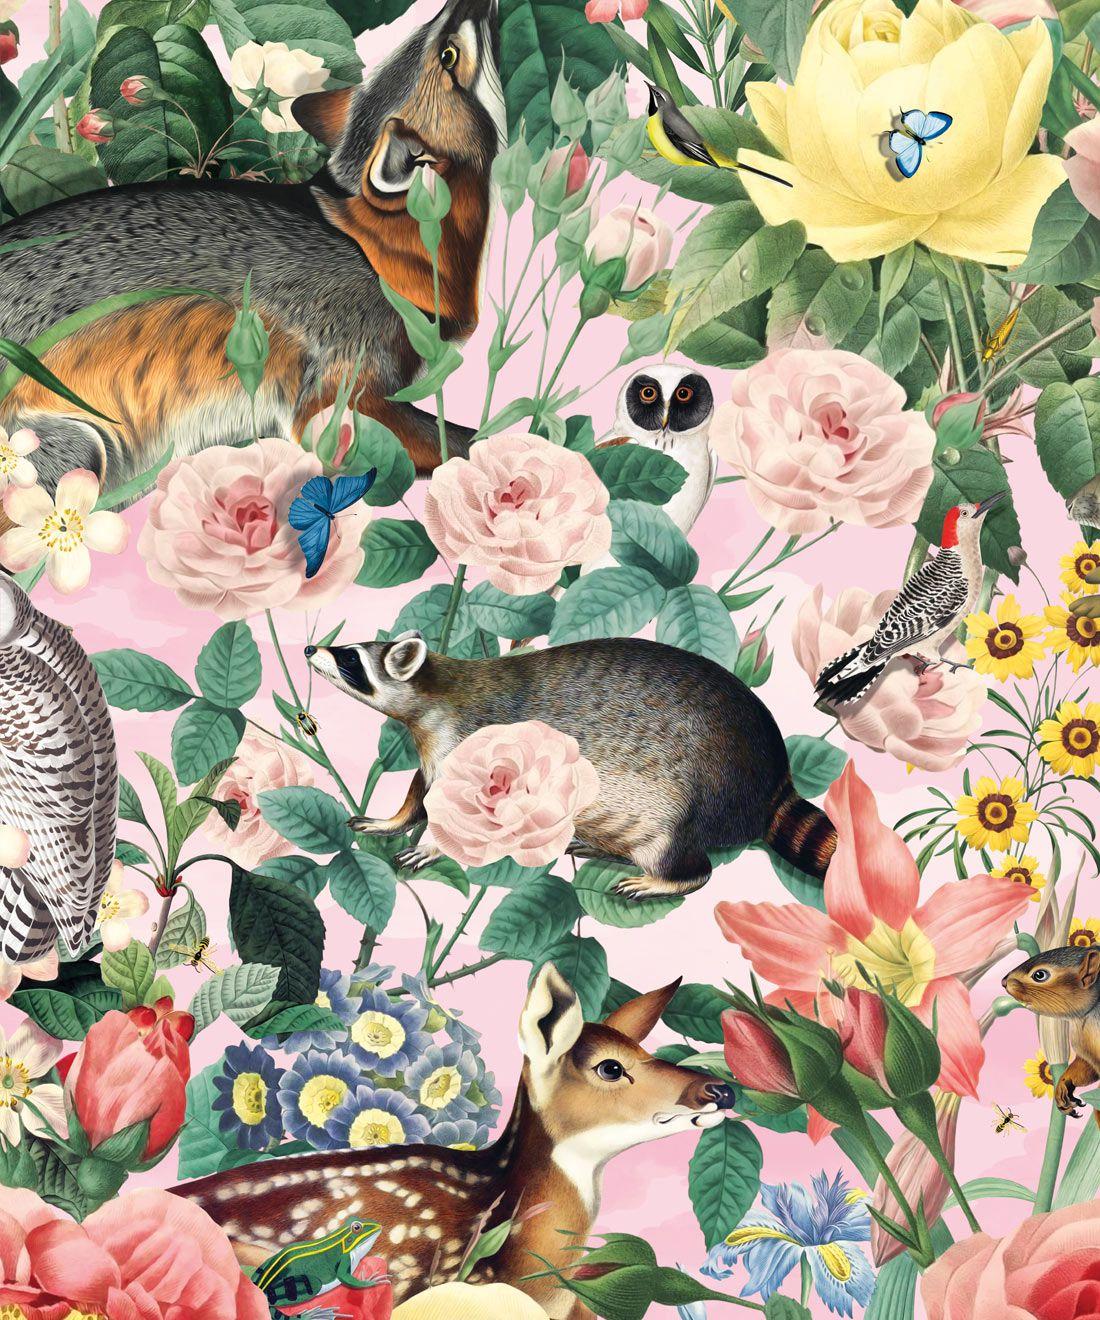 Bush Bouquet Spring Wallpaper • Coral Colored Wallpaper • Assorted Color and Multi-color wallpaper • Floral Wallpaper • Wallpaper With Forest Animals • Swatch